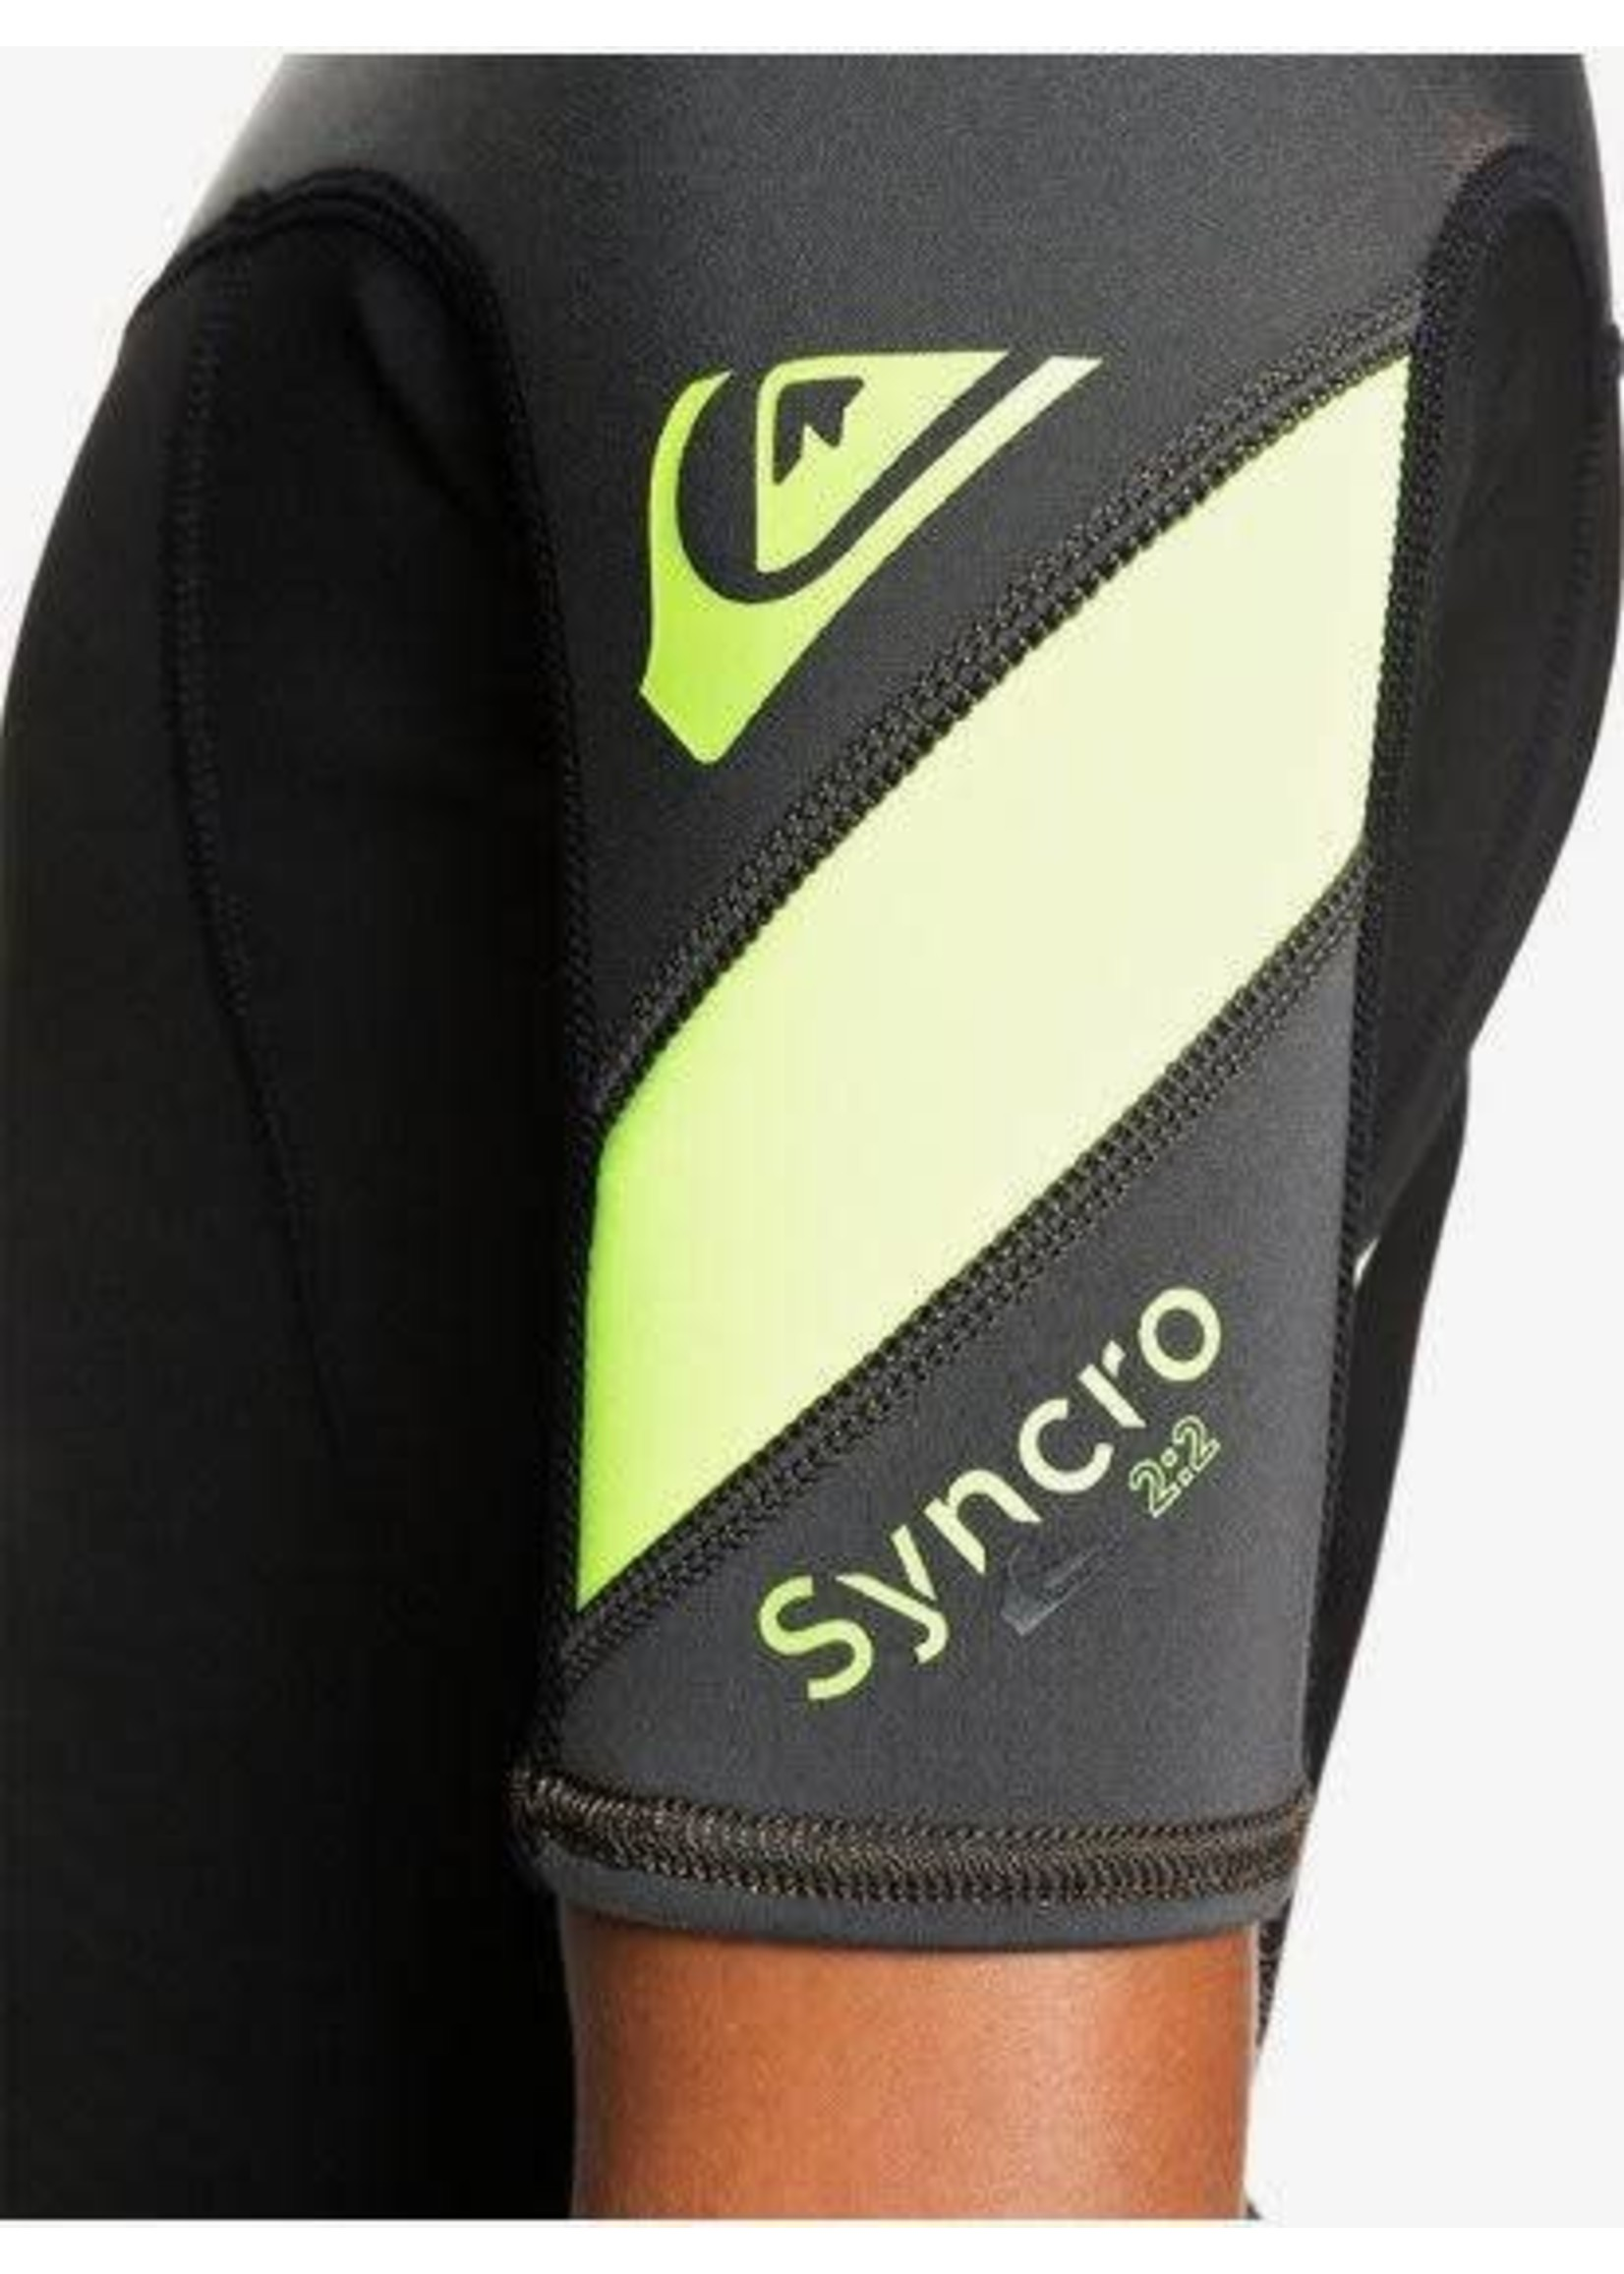 QUIKSILVER Wetsuit 2/2 mm Syncro Springsuit